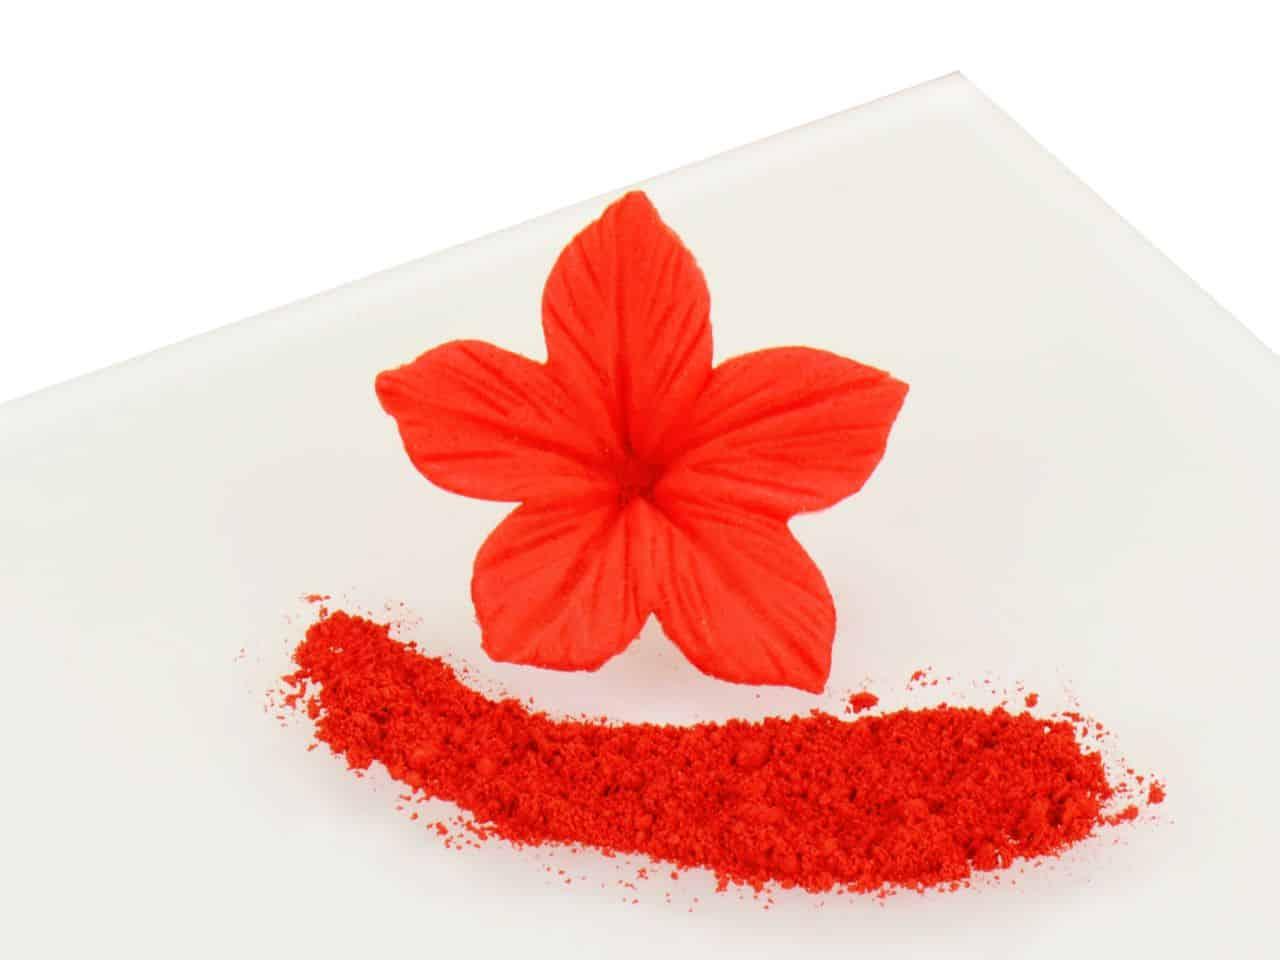 Puderfarbe Cherry Pie - Red 2,5 g V01